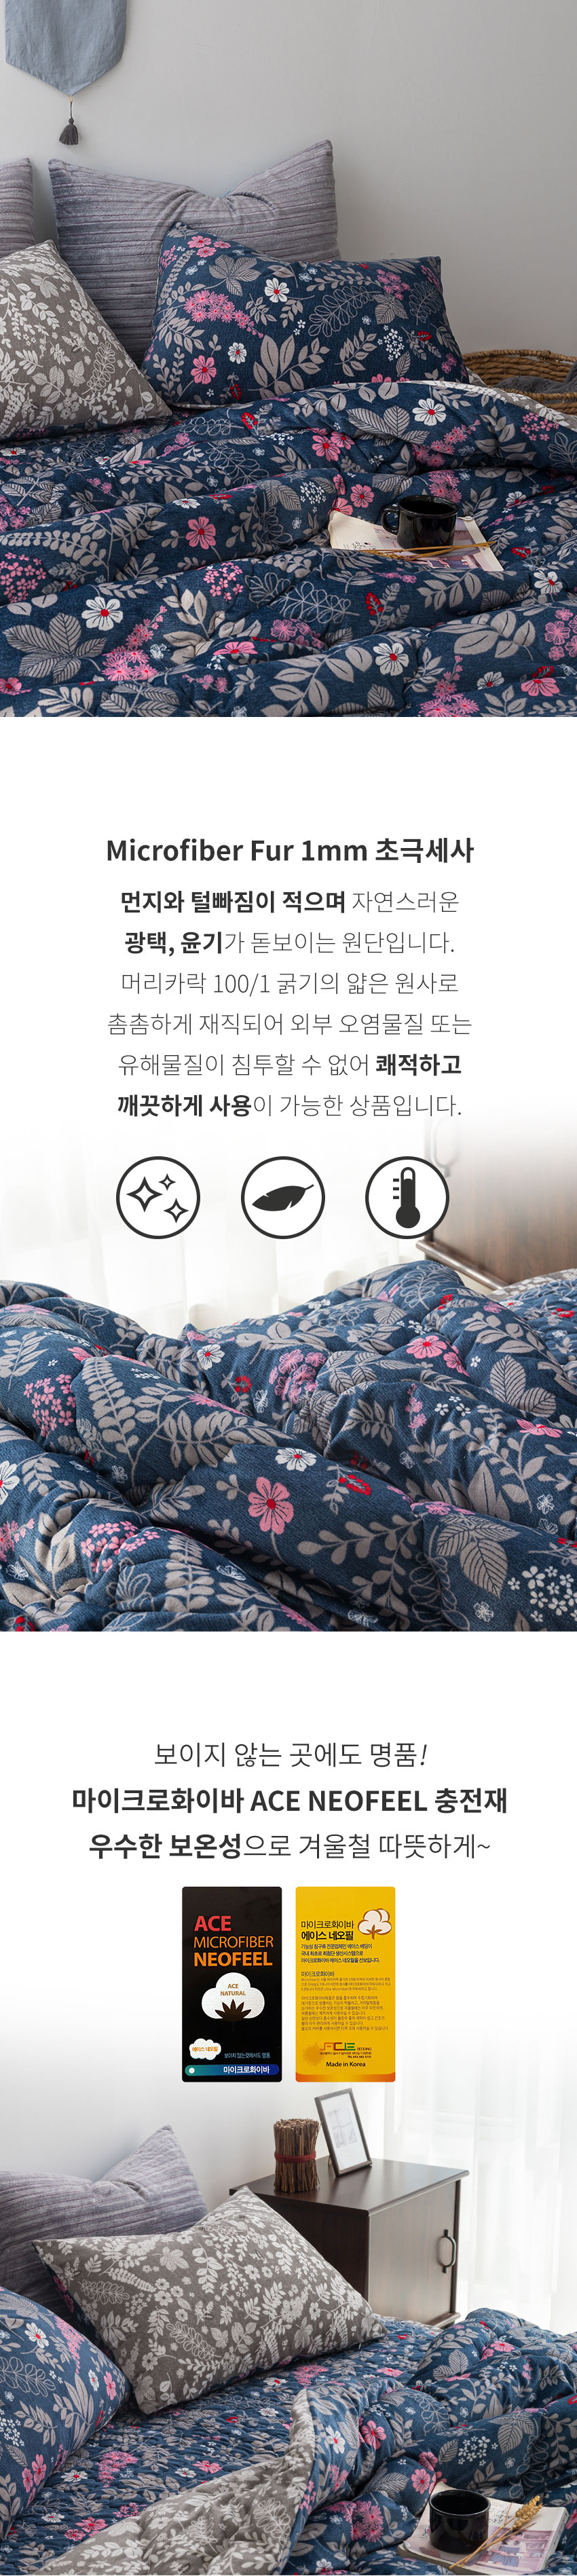 winter_bed_01.jpg